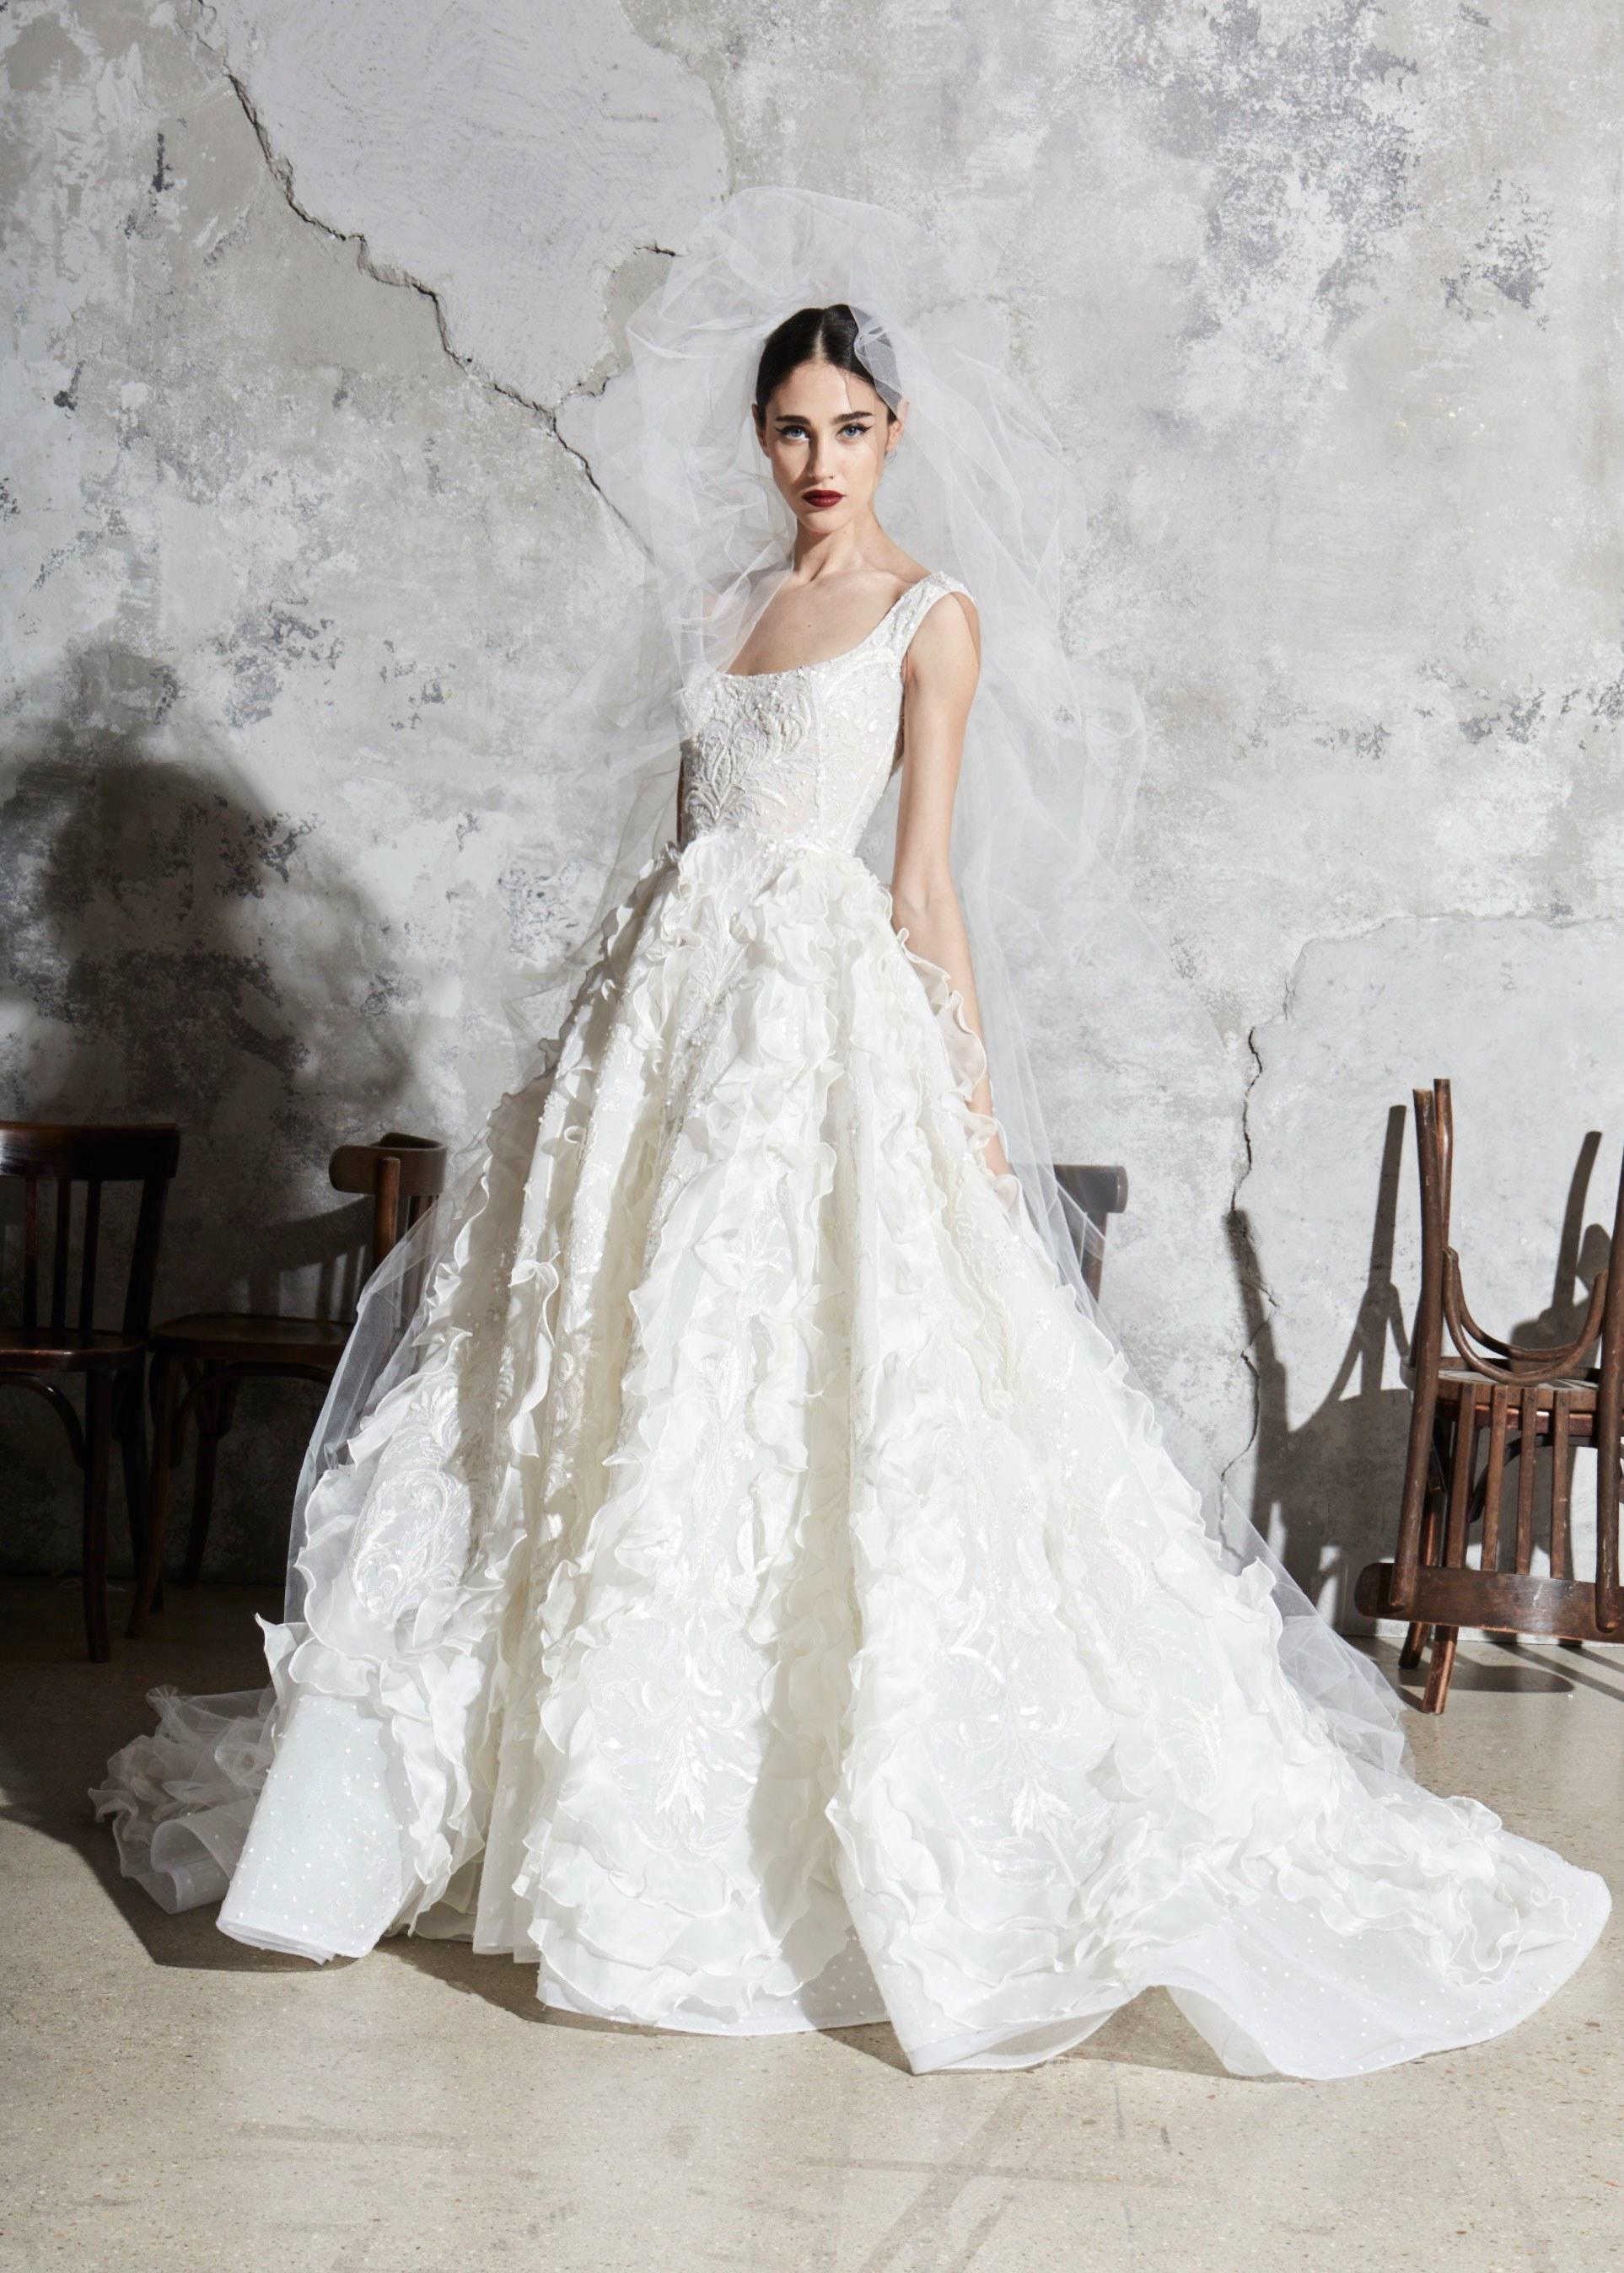 00018-zuhair-murad-new-york-bridal-Spring-2020-CREDIT-Thomas-Nutzl.jpg